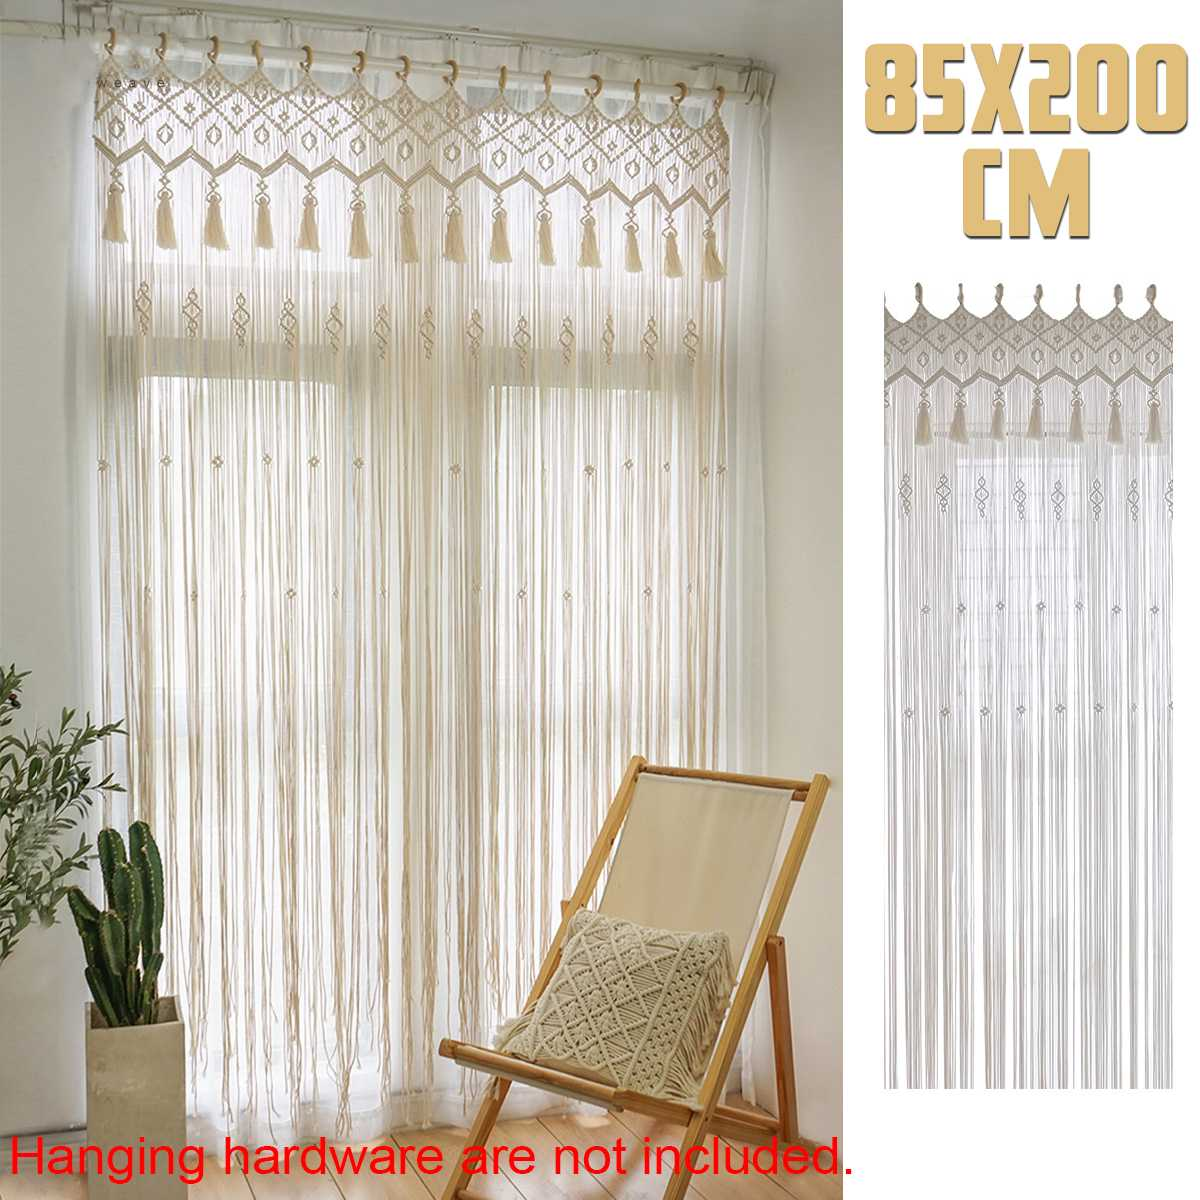 Bohemian Handmade Macrame Curtain Bohemian Wedding Backdrop 200x85cm Cotton Rope Photo Backdrop Home Room Wall Hanging Tapestry